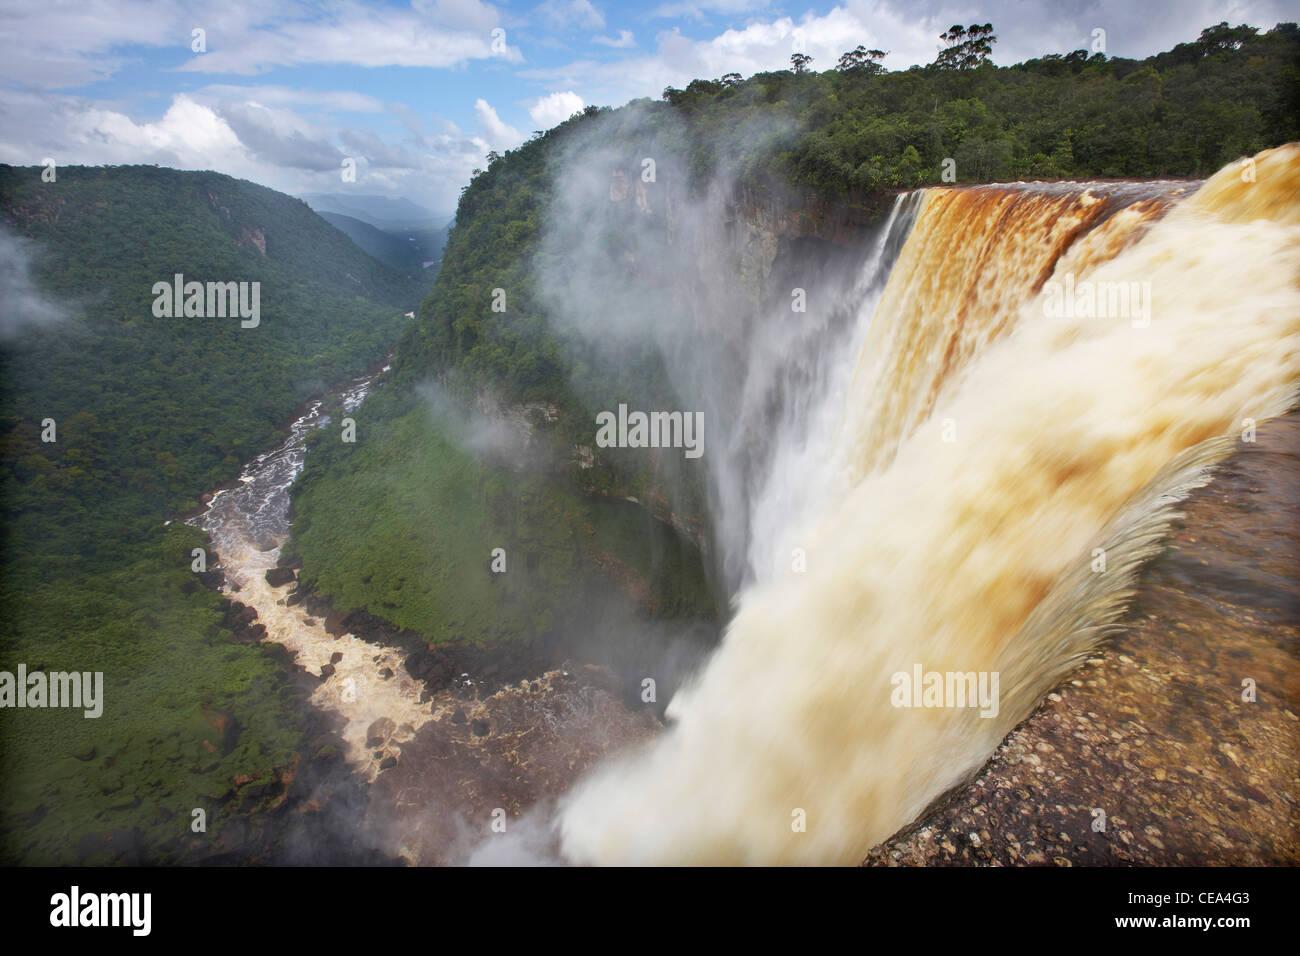 Kaieteur Falls, Potaro River, Guyana, South America, reputedly the world's largest single-drop waterfall. - Stock Image